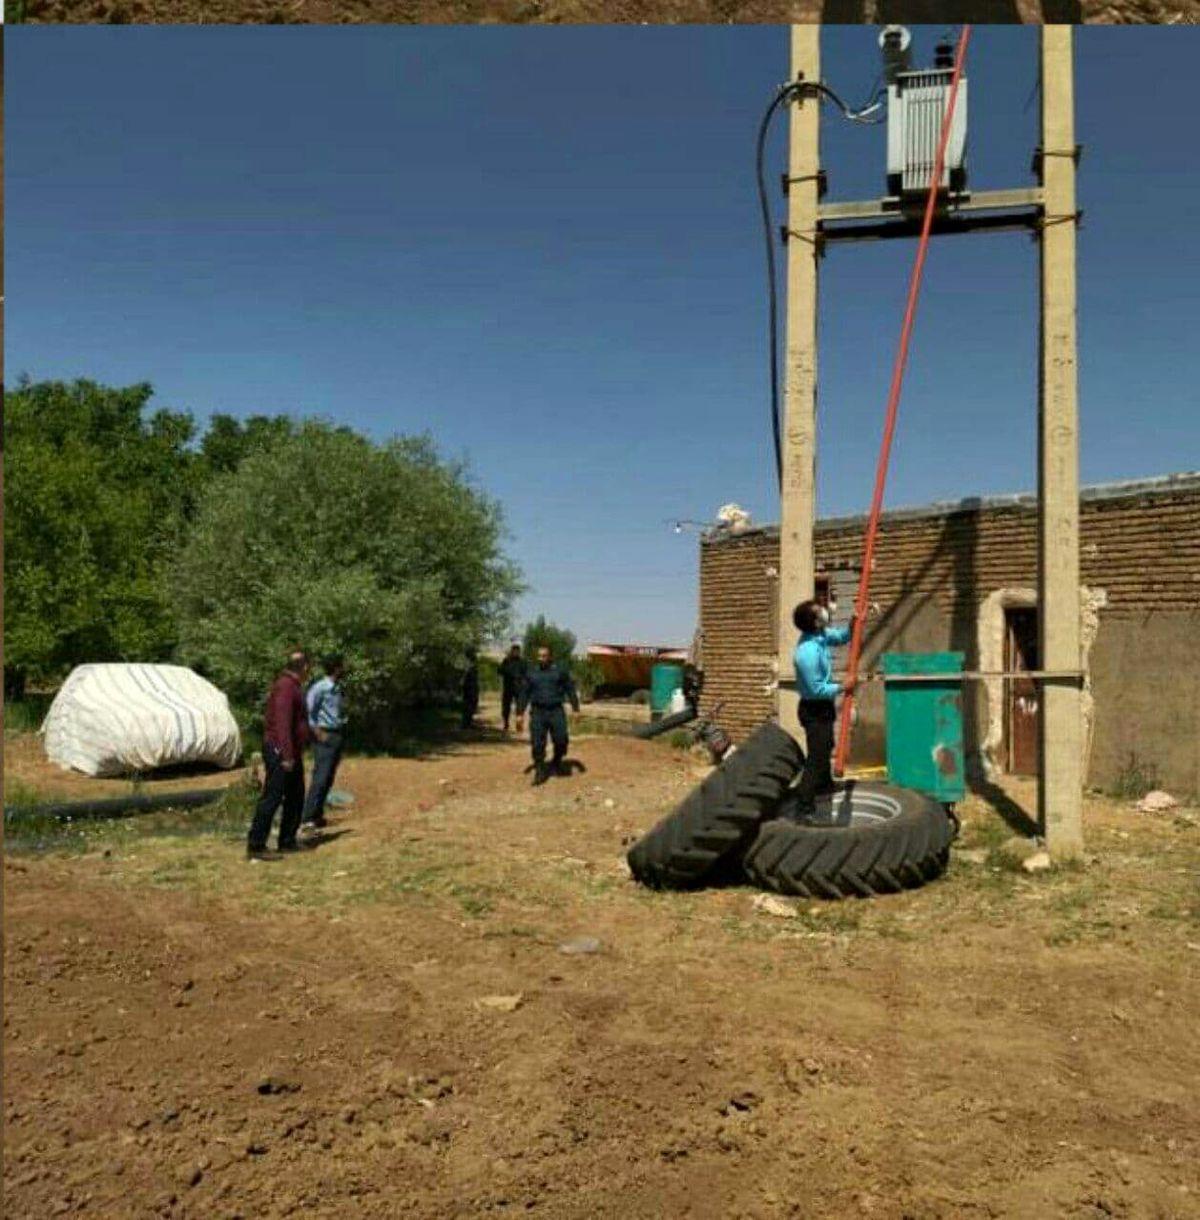 پلمپ و قطع برق ۵ حلقه چاه کشاورزی متخلف در سلسله